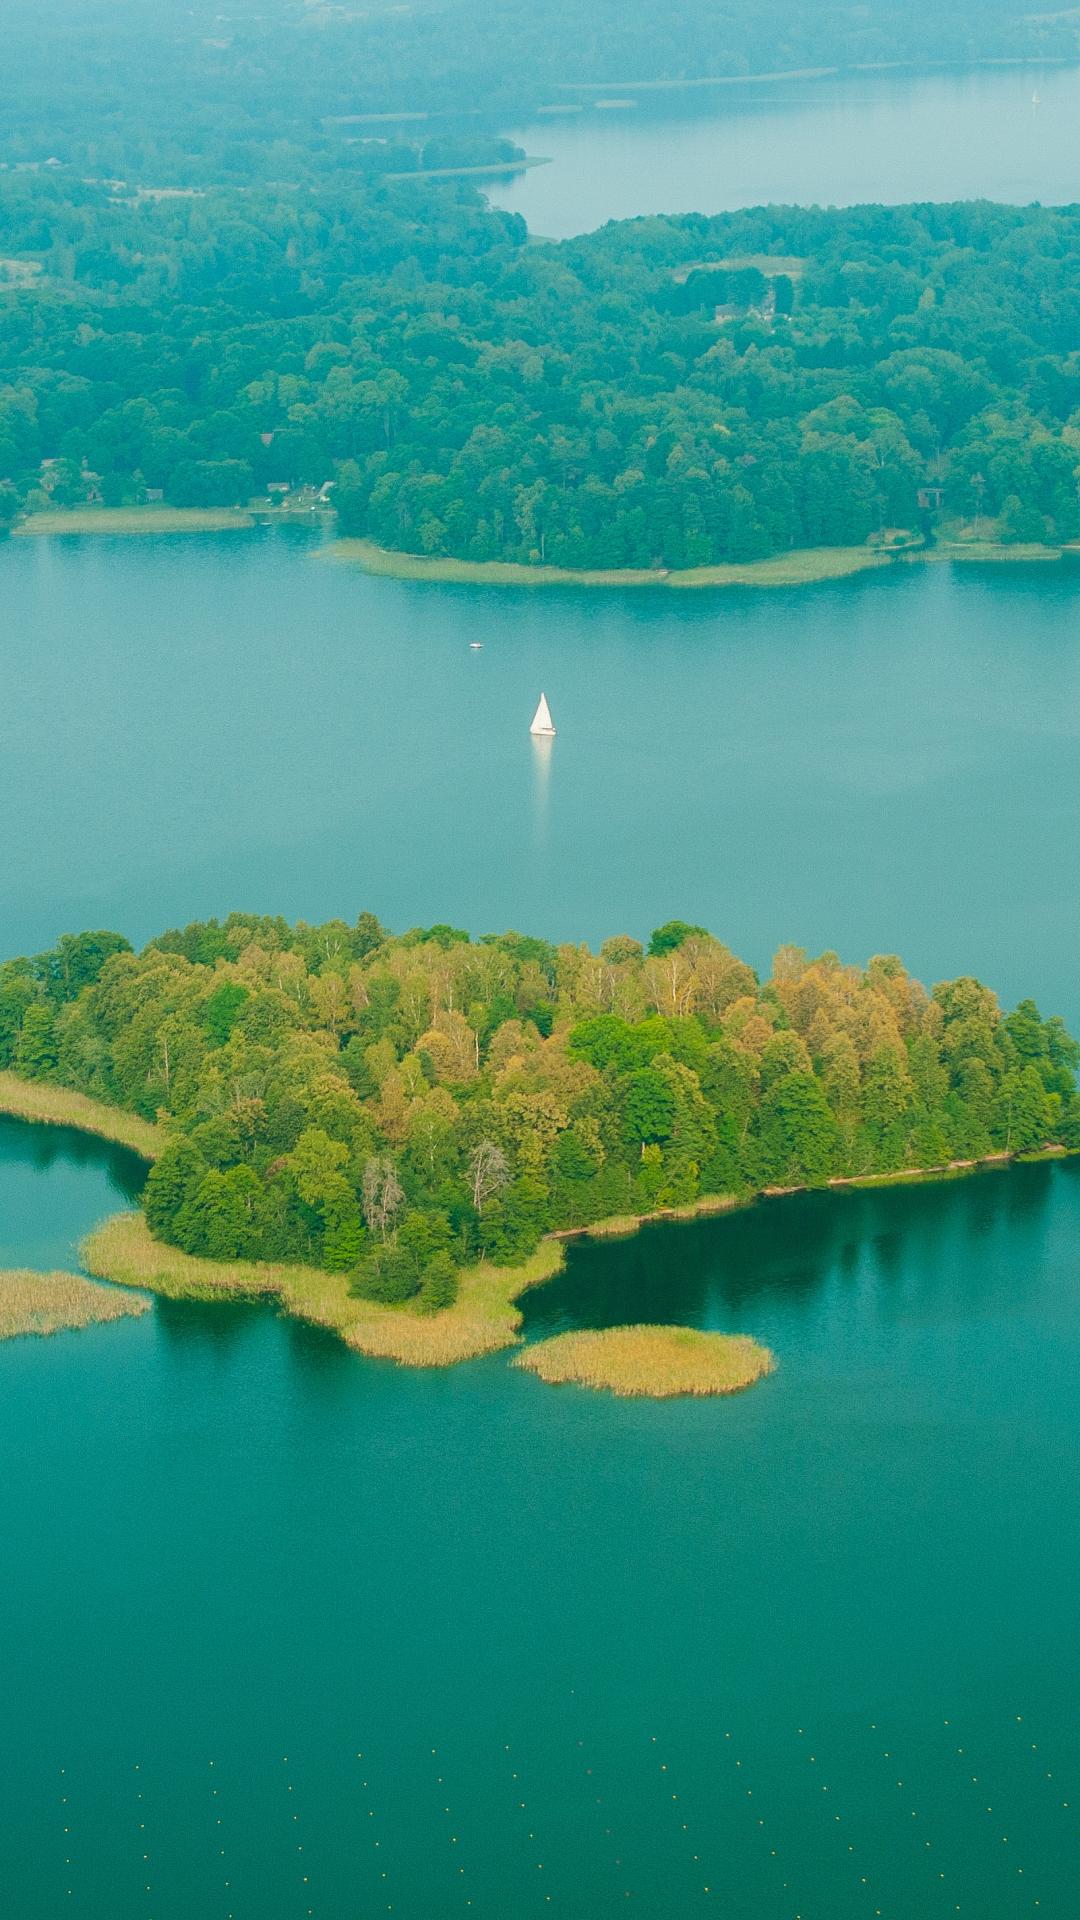 Lake, Majestic iPhone Wallpaper